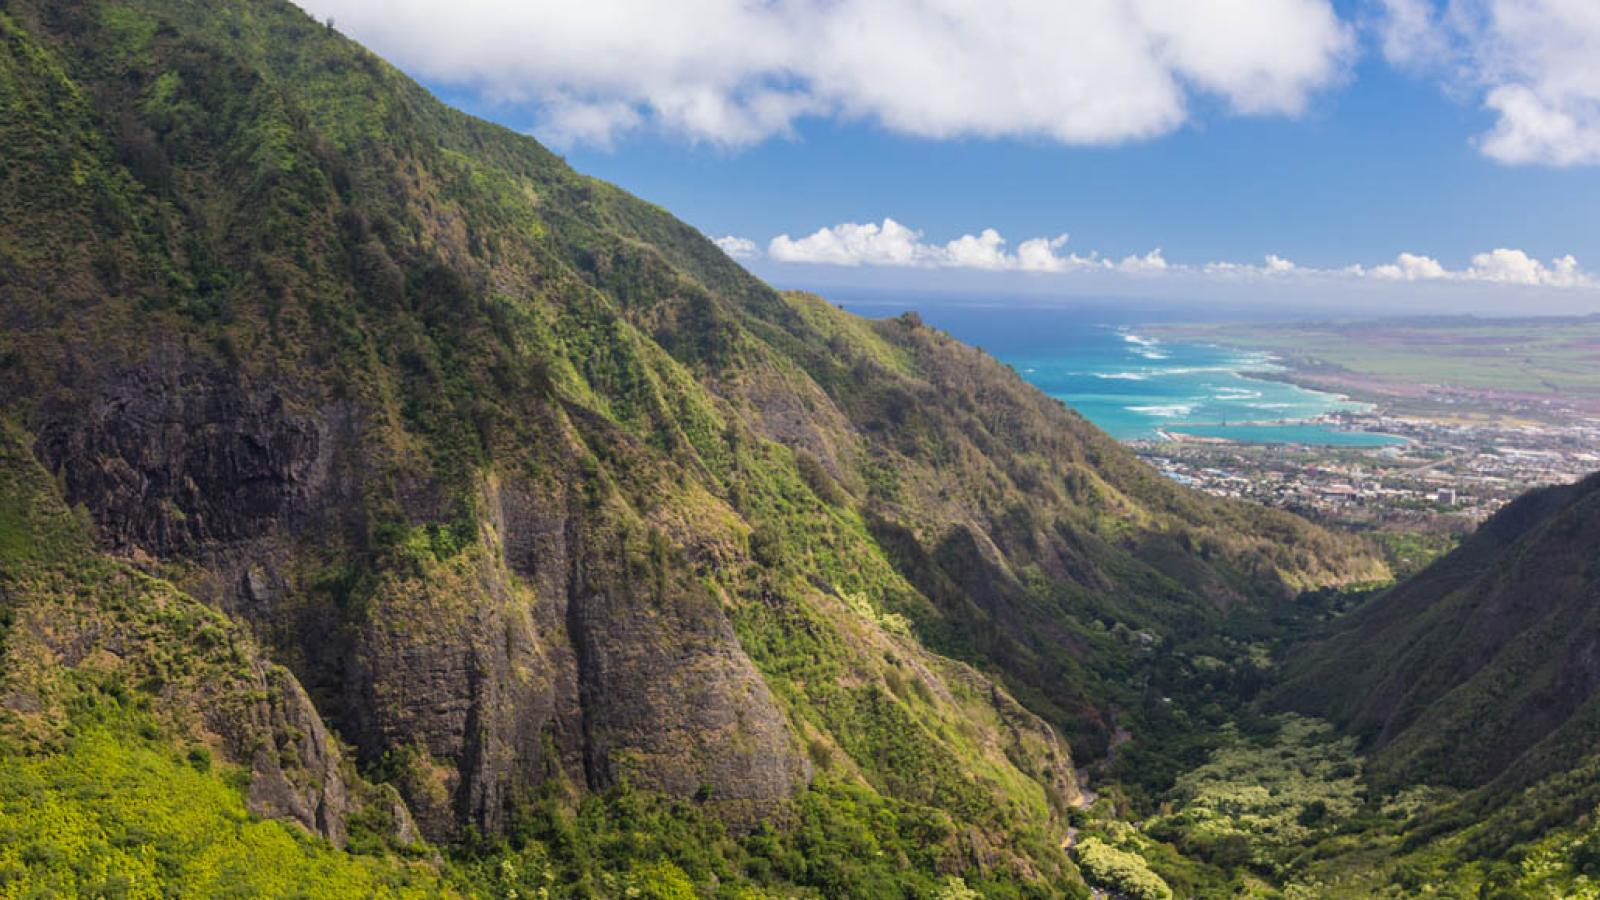 Hear a Hawaiian Chant